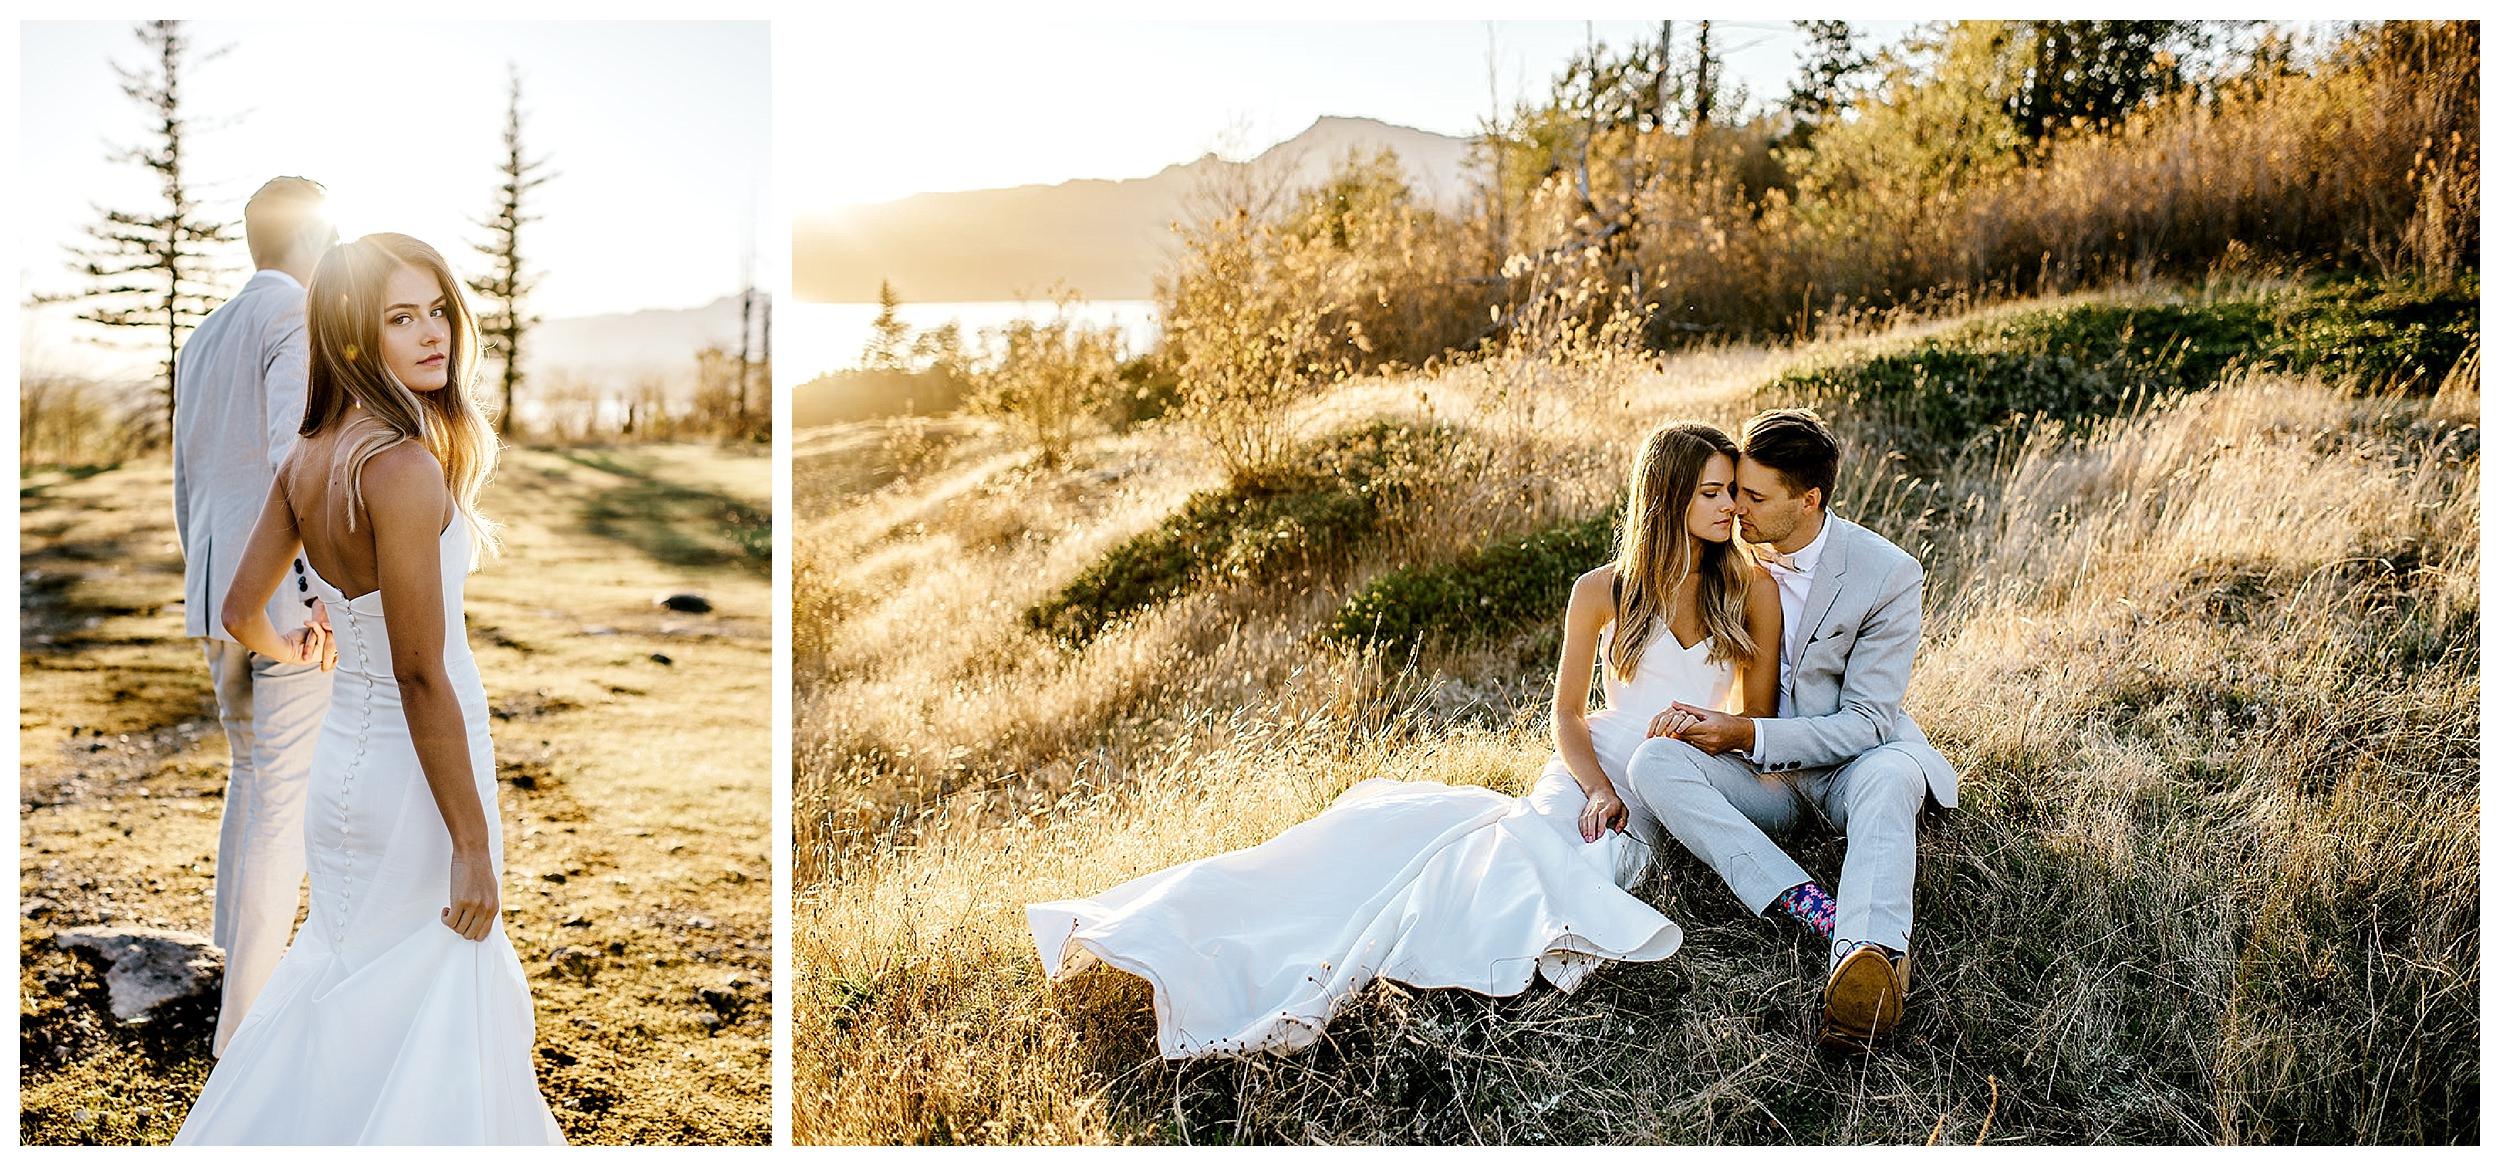 Portland-Wedding-Photographer-Columbia-River-Gorge-elopement27.jpg